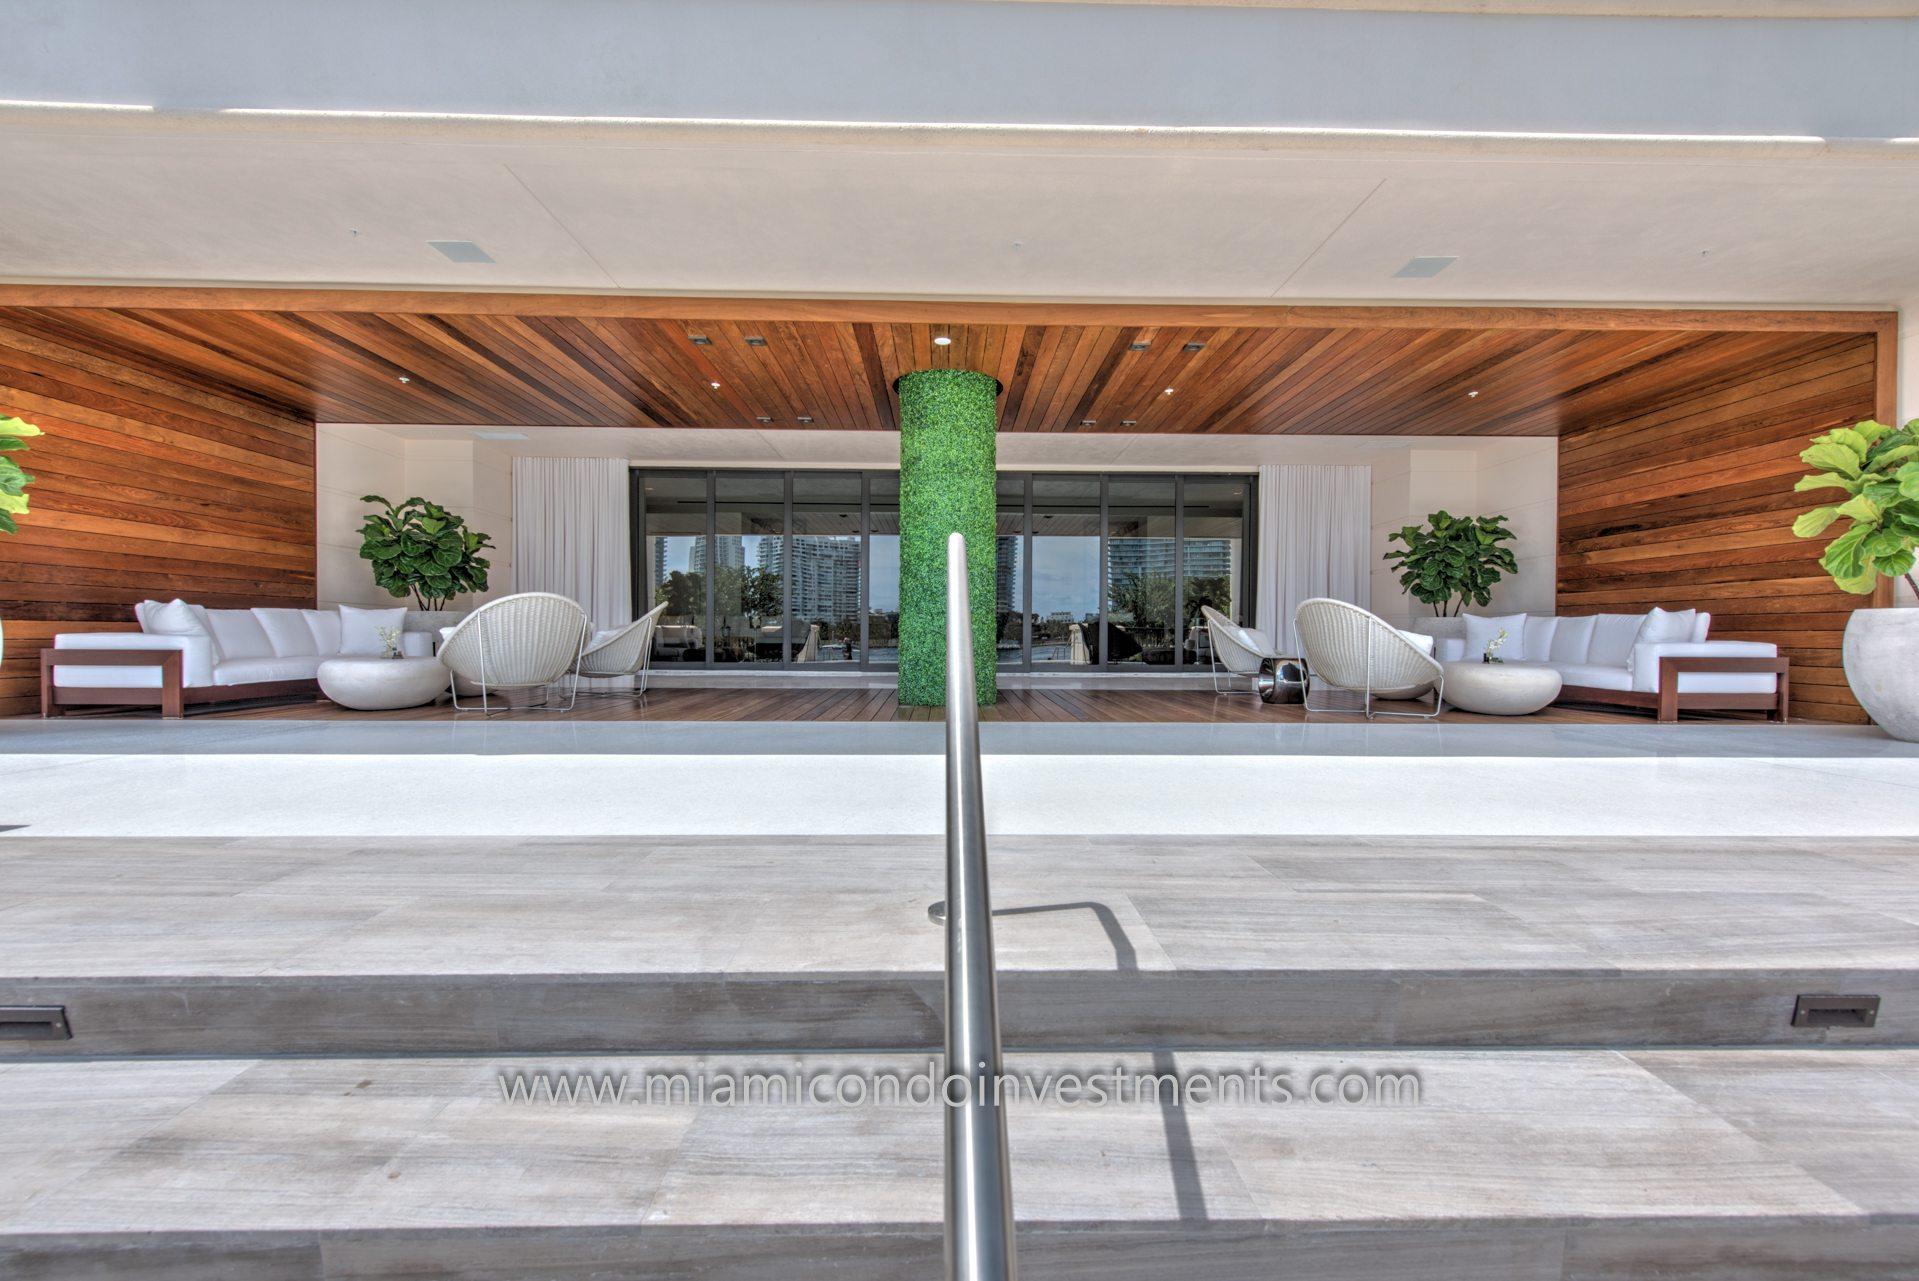 palazzo-del-sol-amenities-common-areas-8